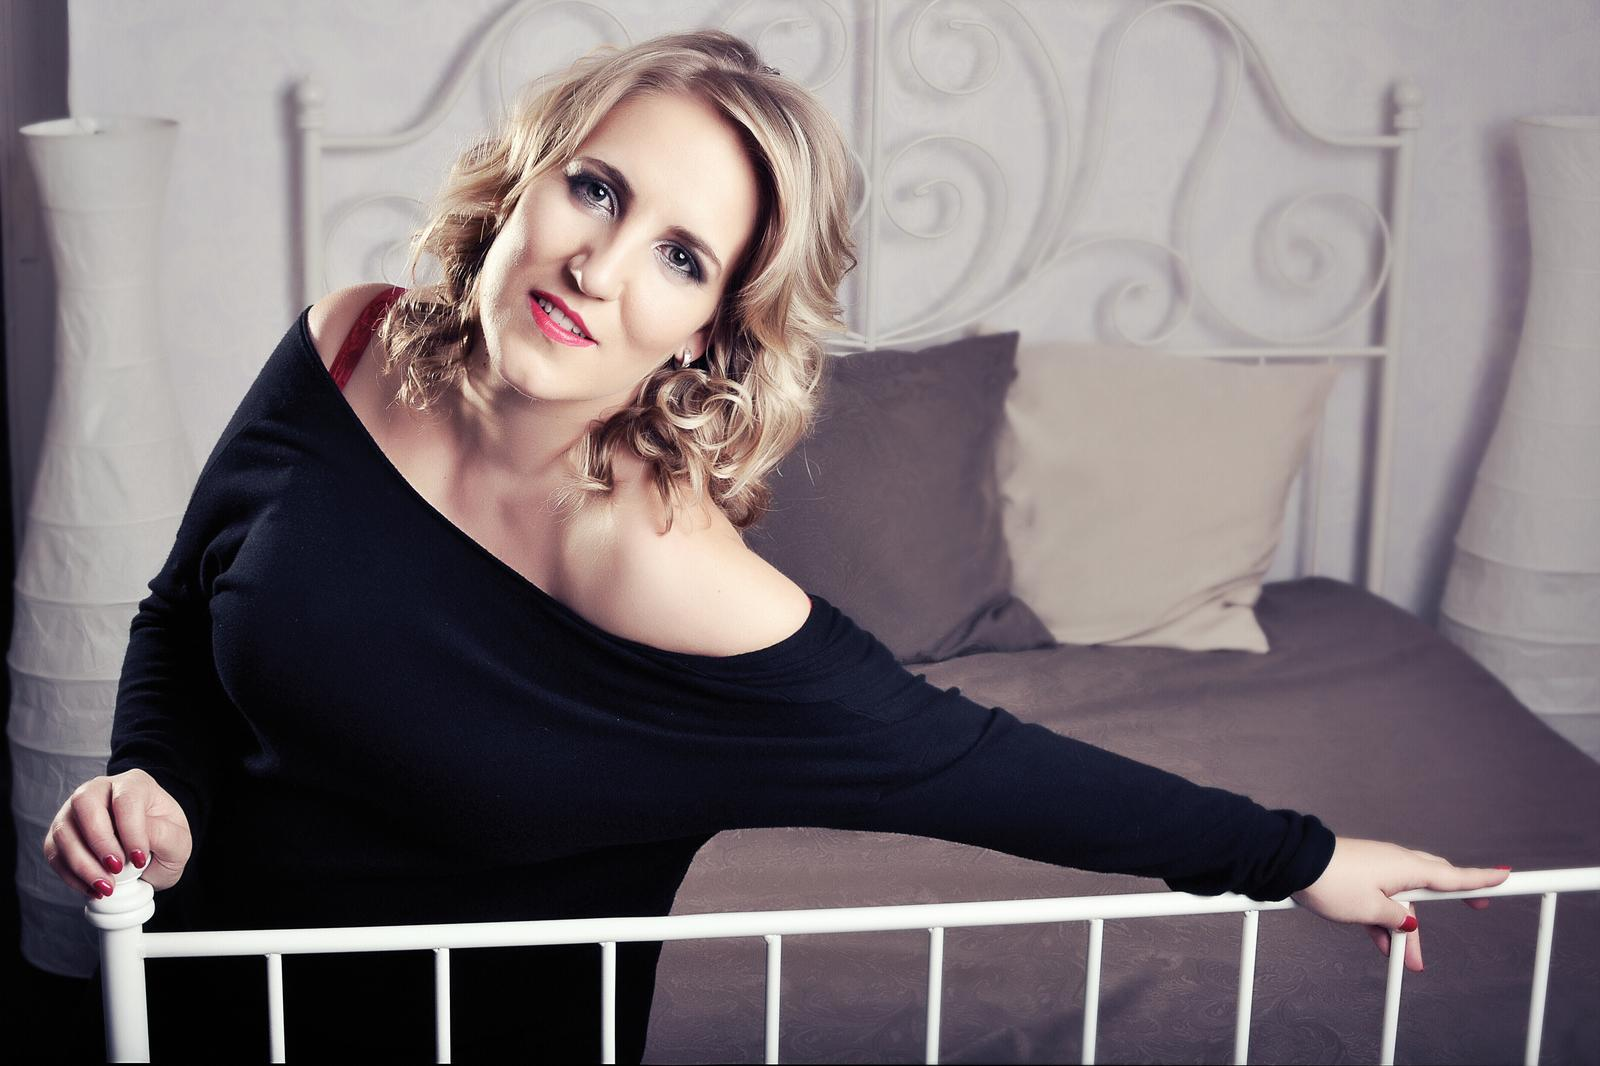 daluc - Hair&Make-up: Lucie Vitejčková